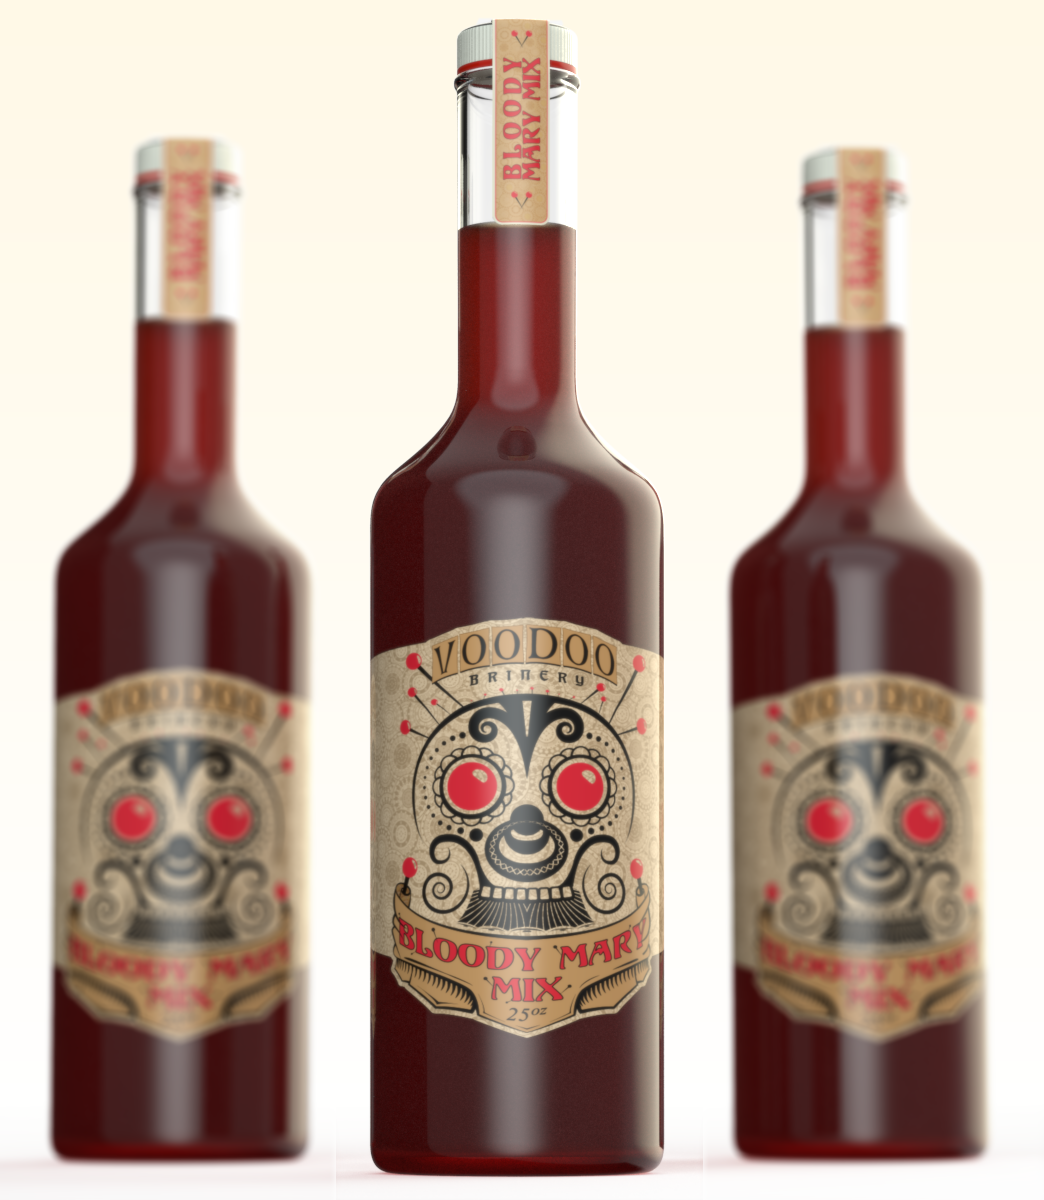 Bloody Mary Bottle Design by Dordea Paul by Mandeologul